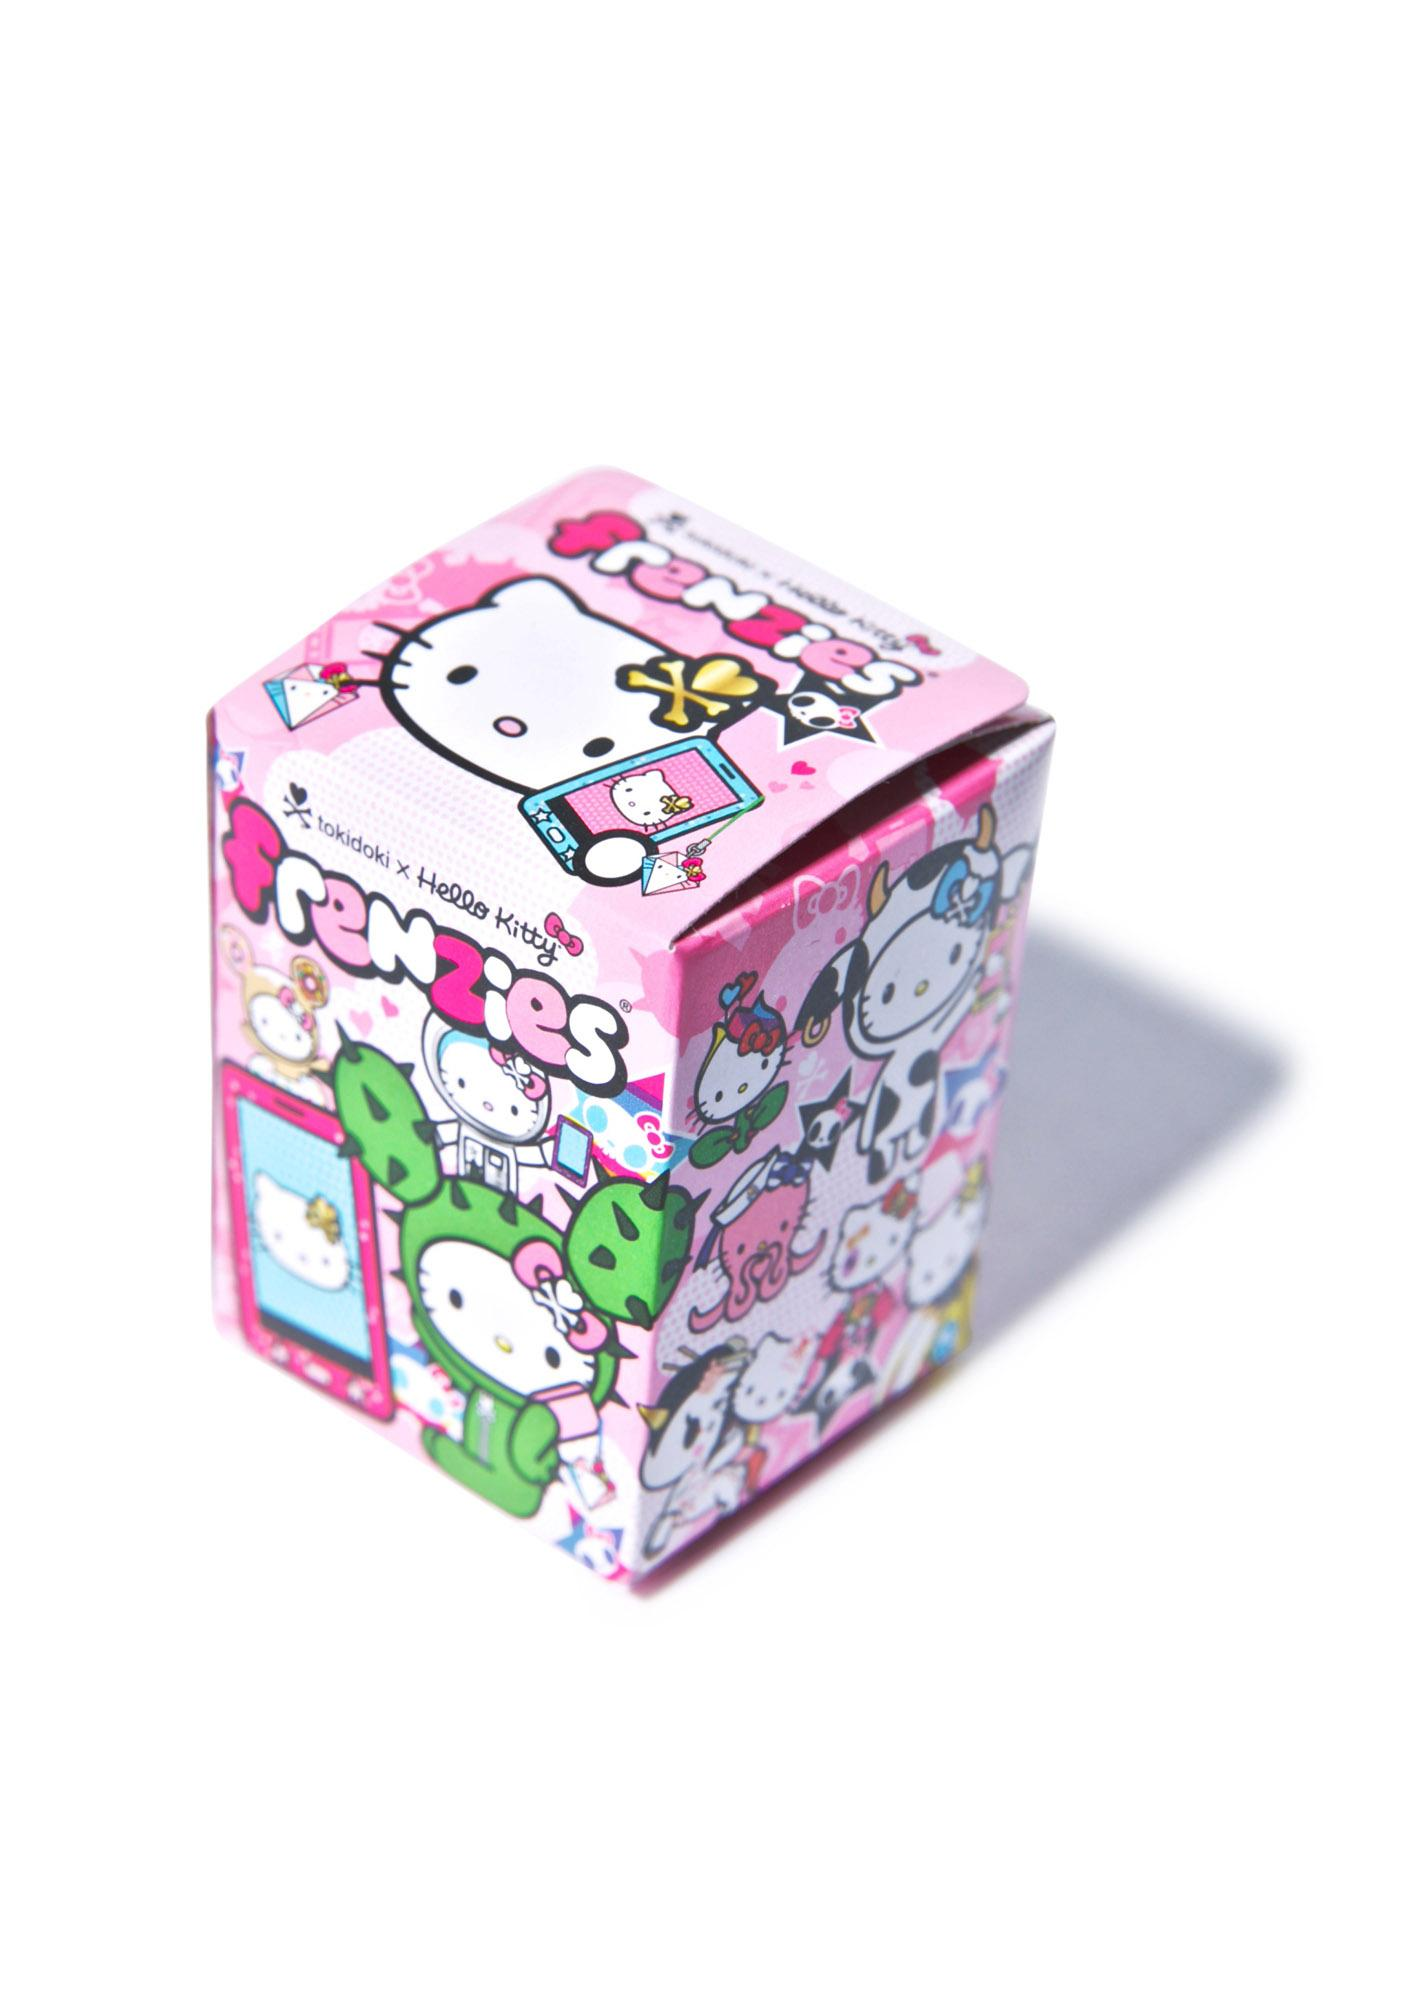 Tokidoki Unicorno Frenzies X Hello Kitty Blind Box Dolls